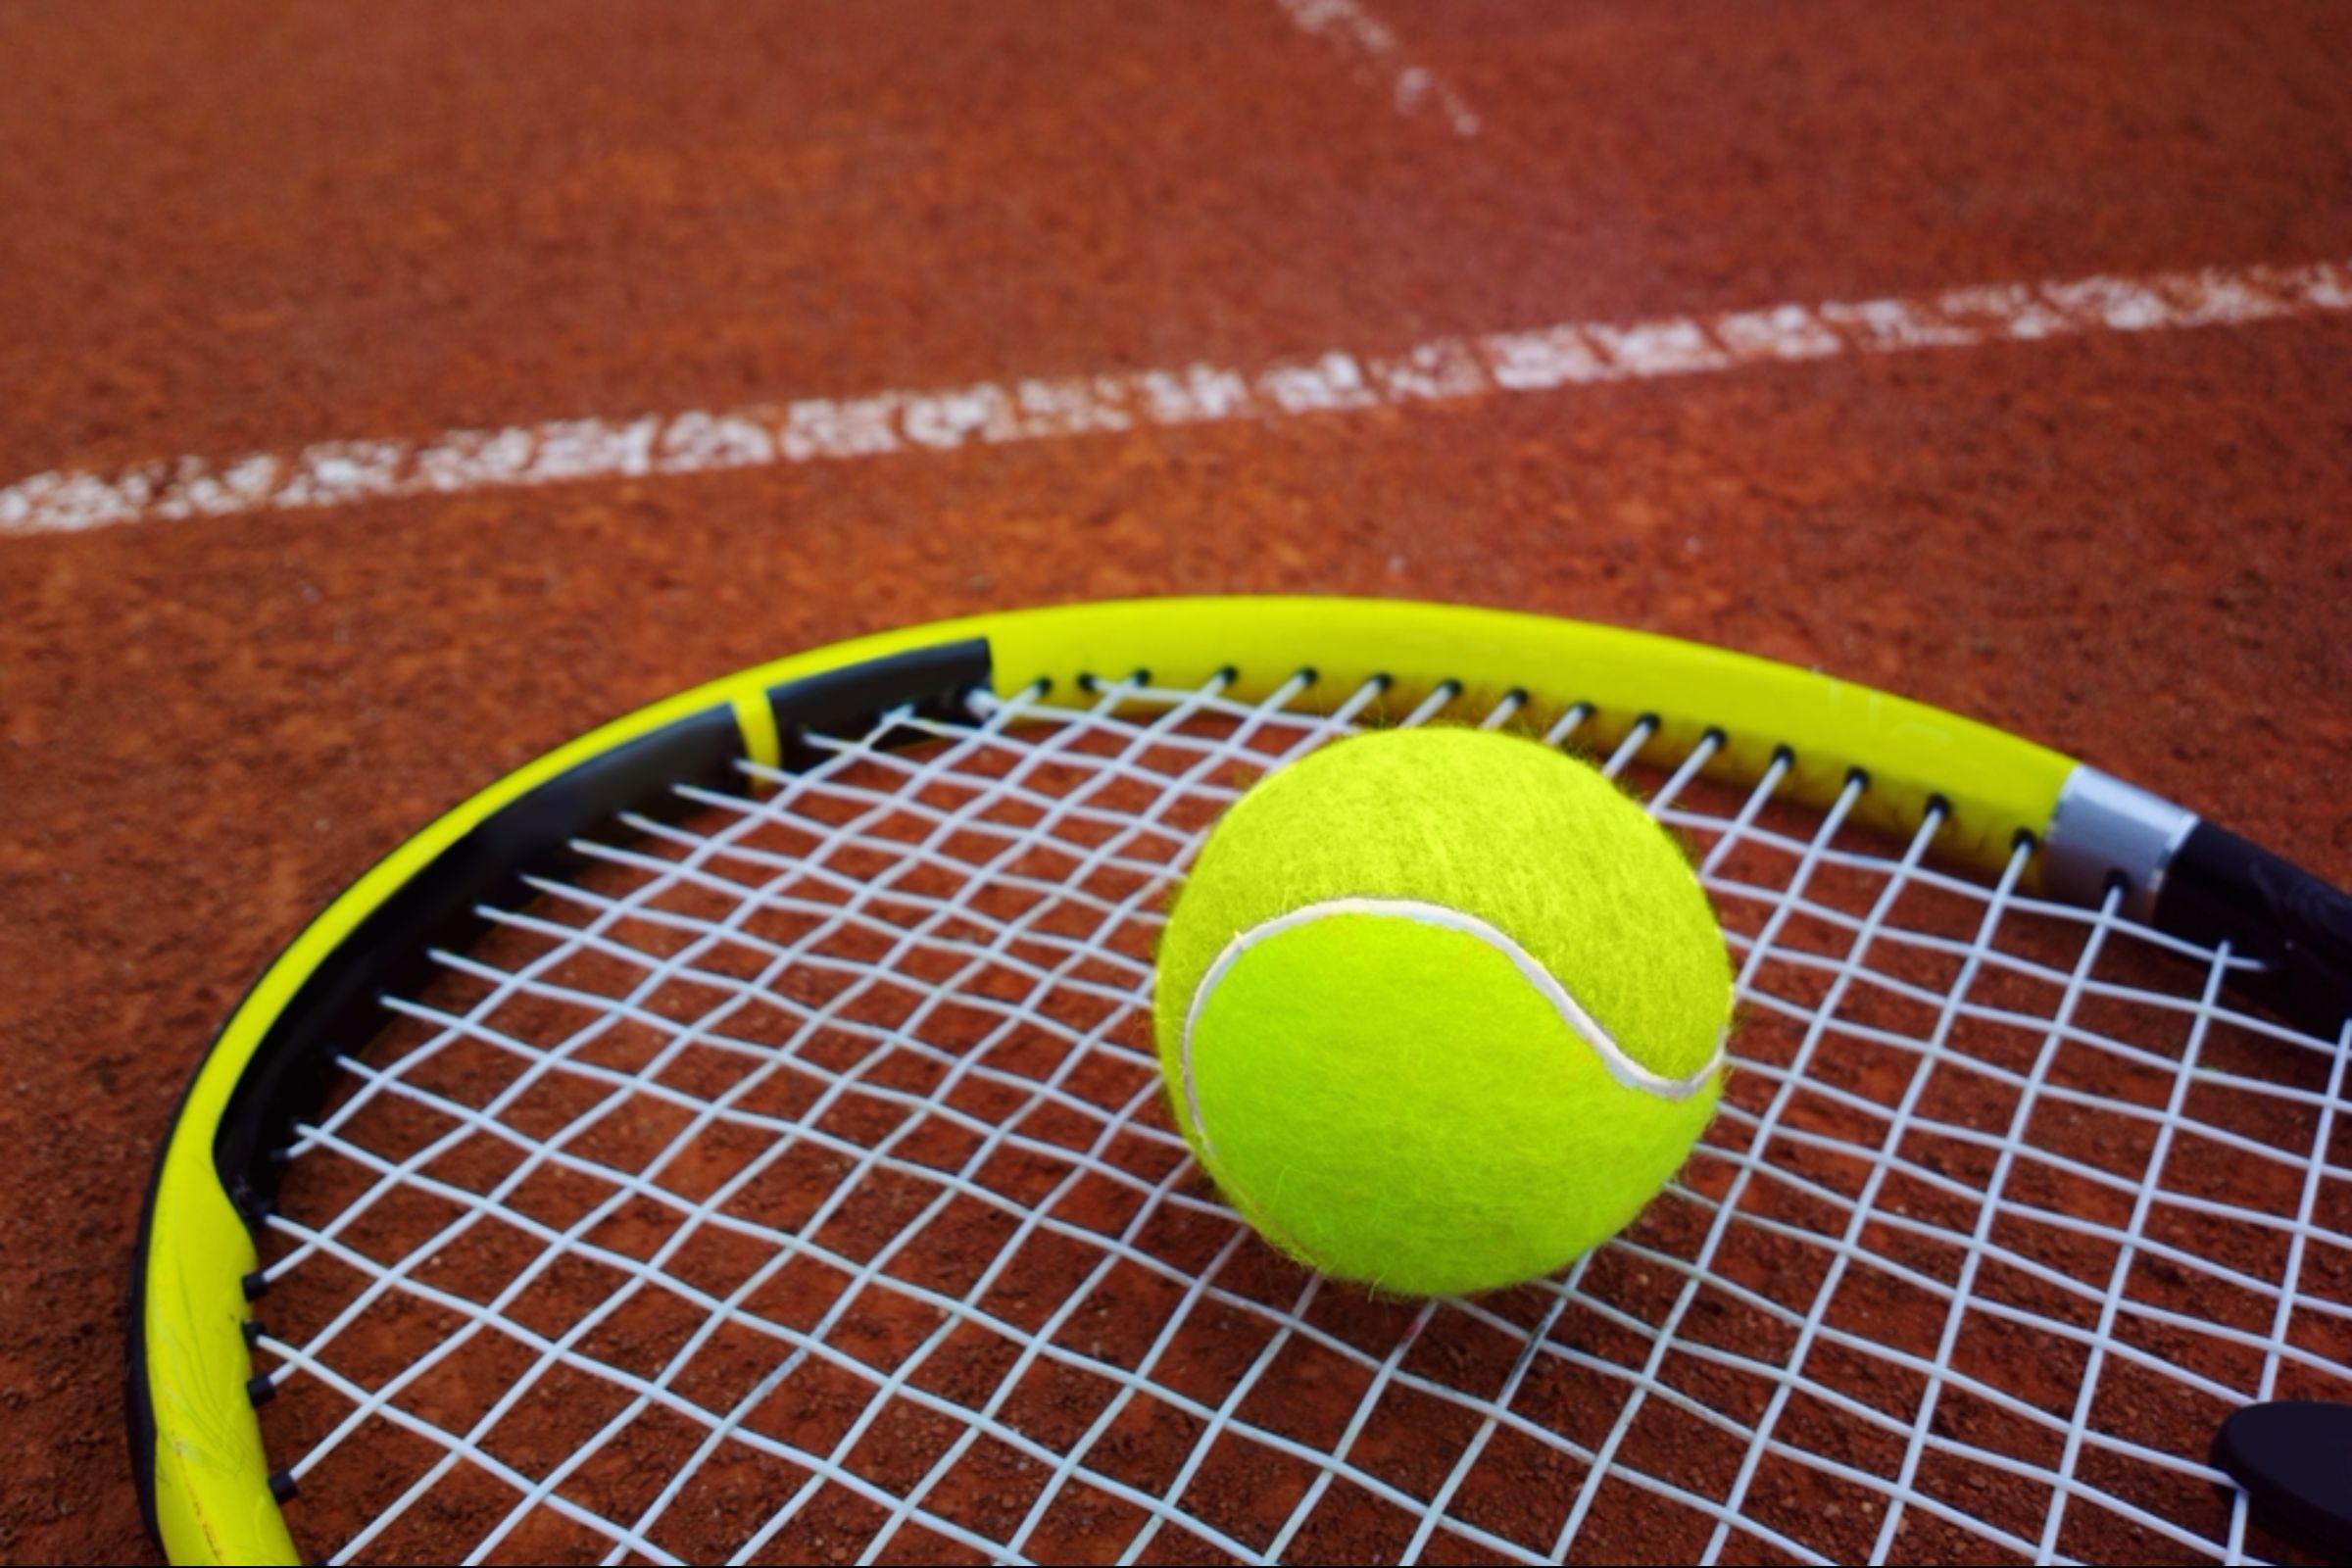 Tennis ball on tennis racket